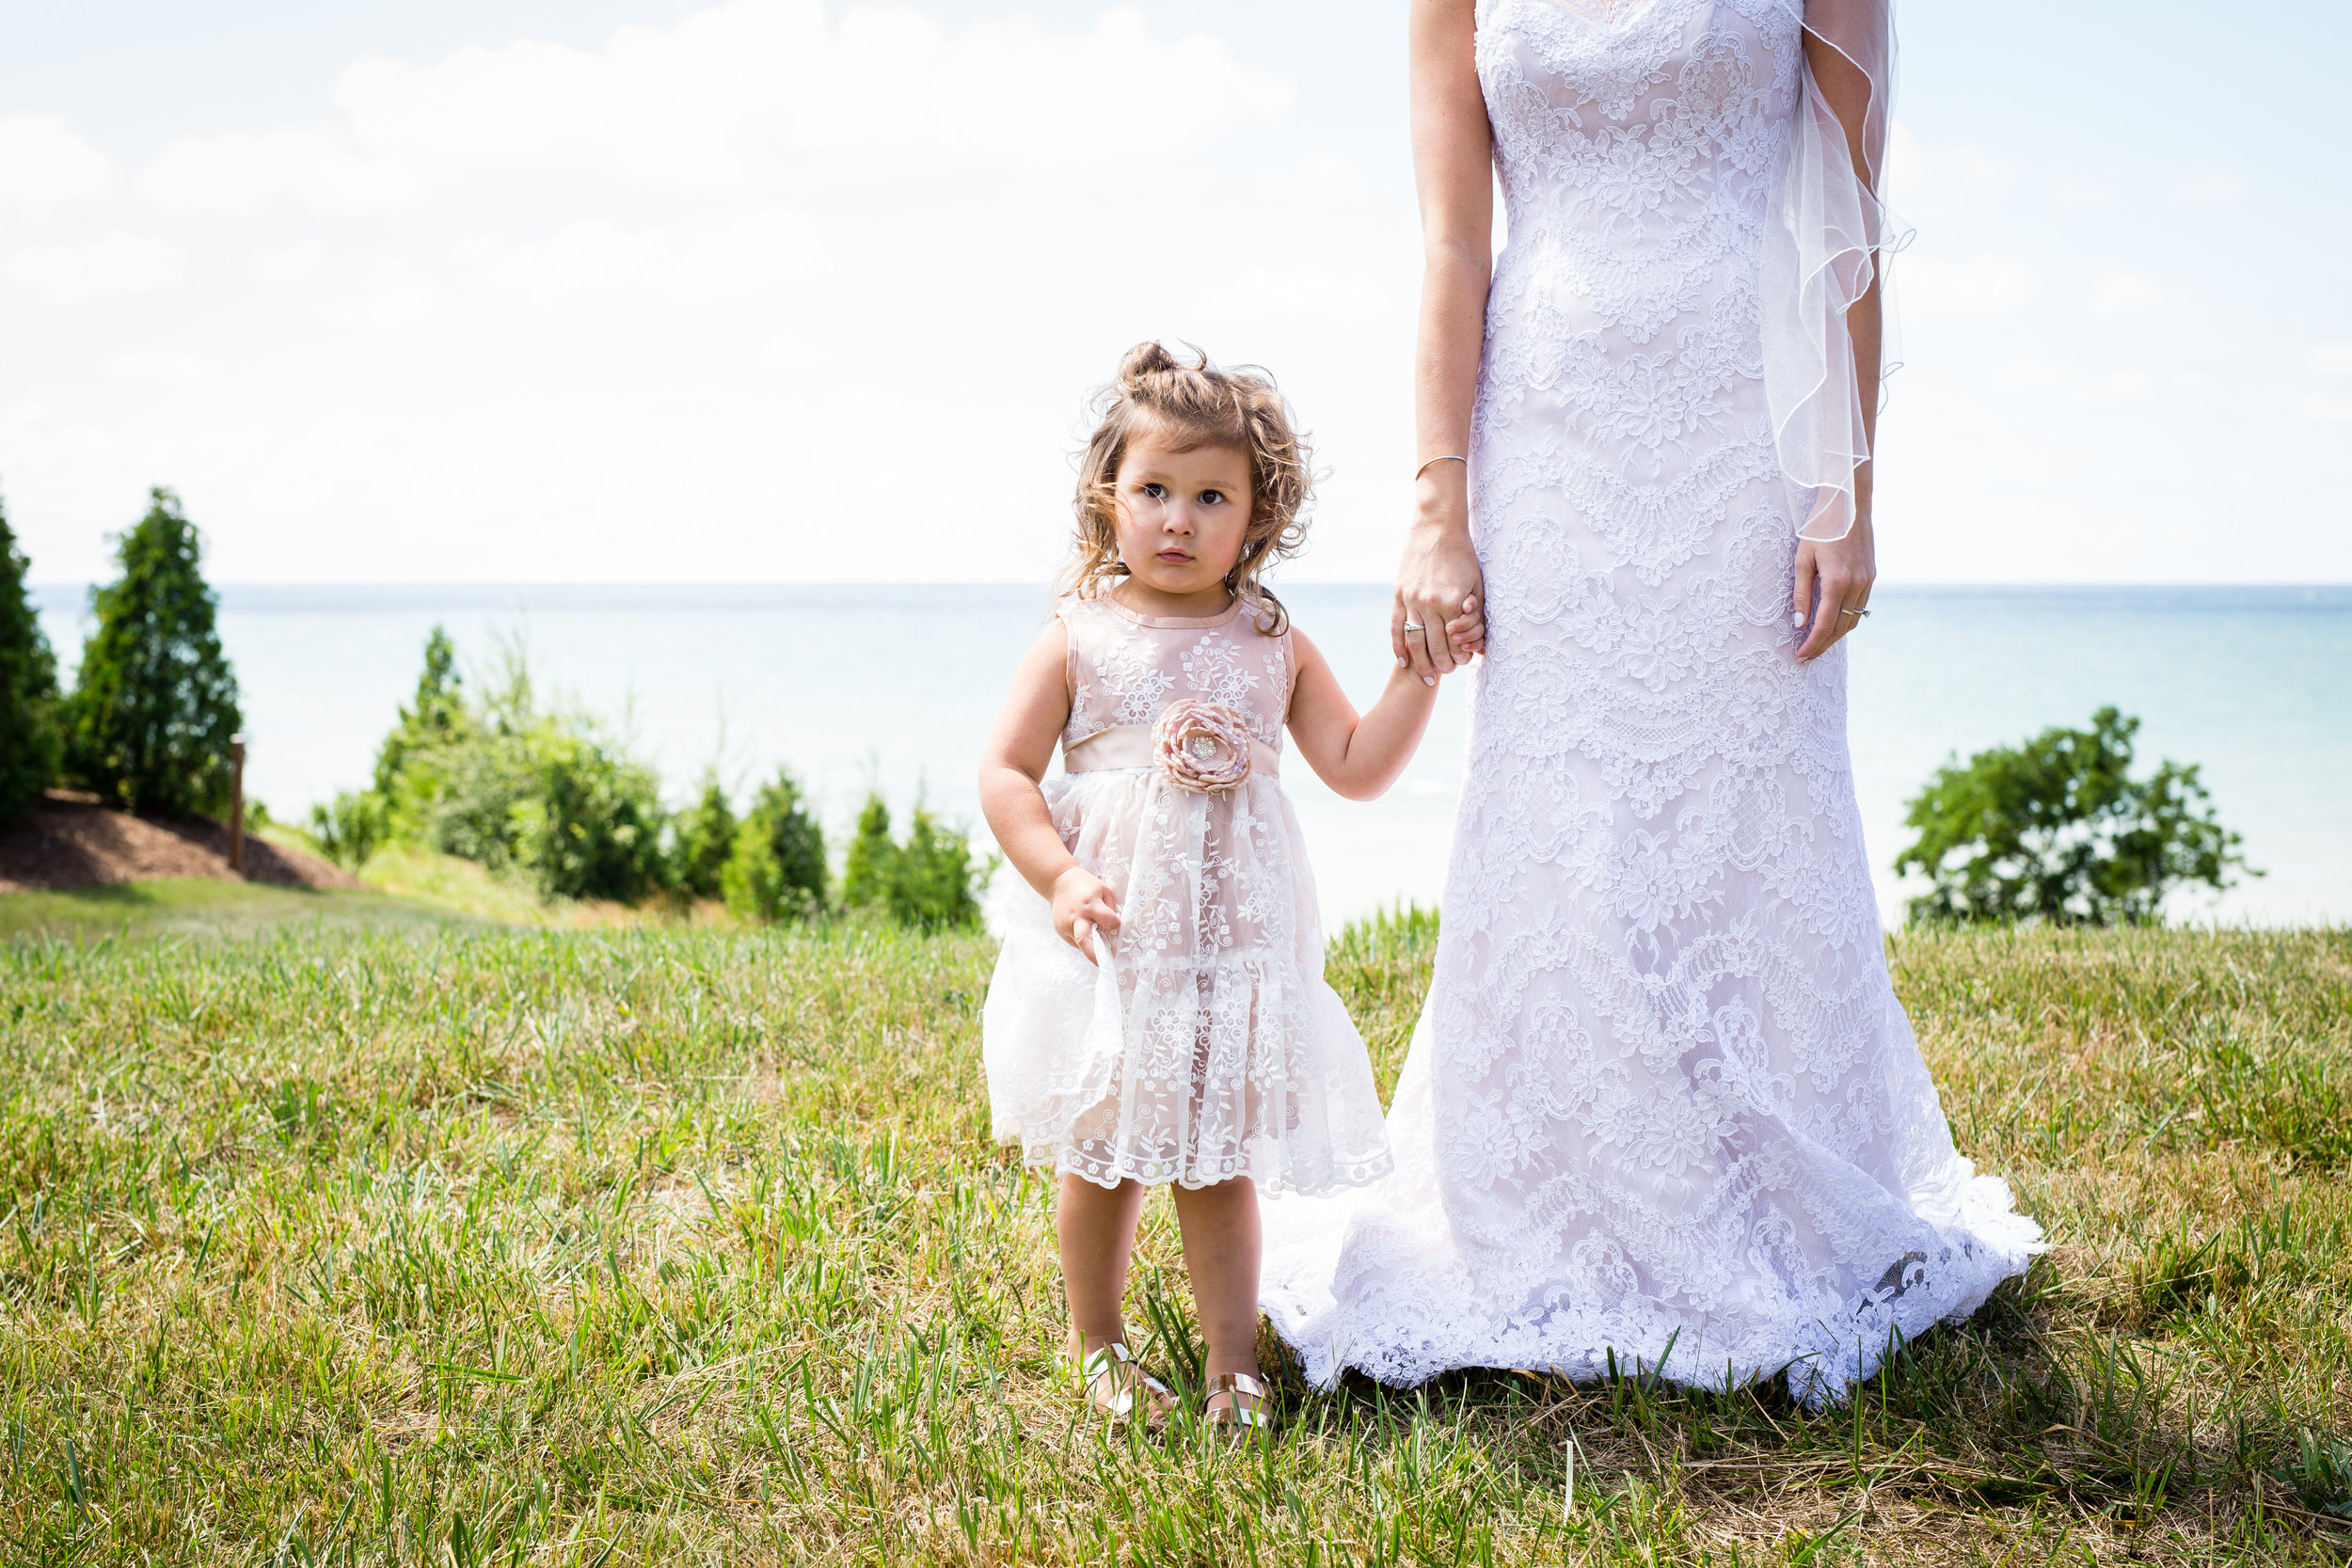 Tim&Polly_Wedding_12CornerVineyard_blog030.JPG